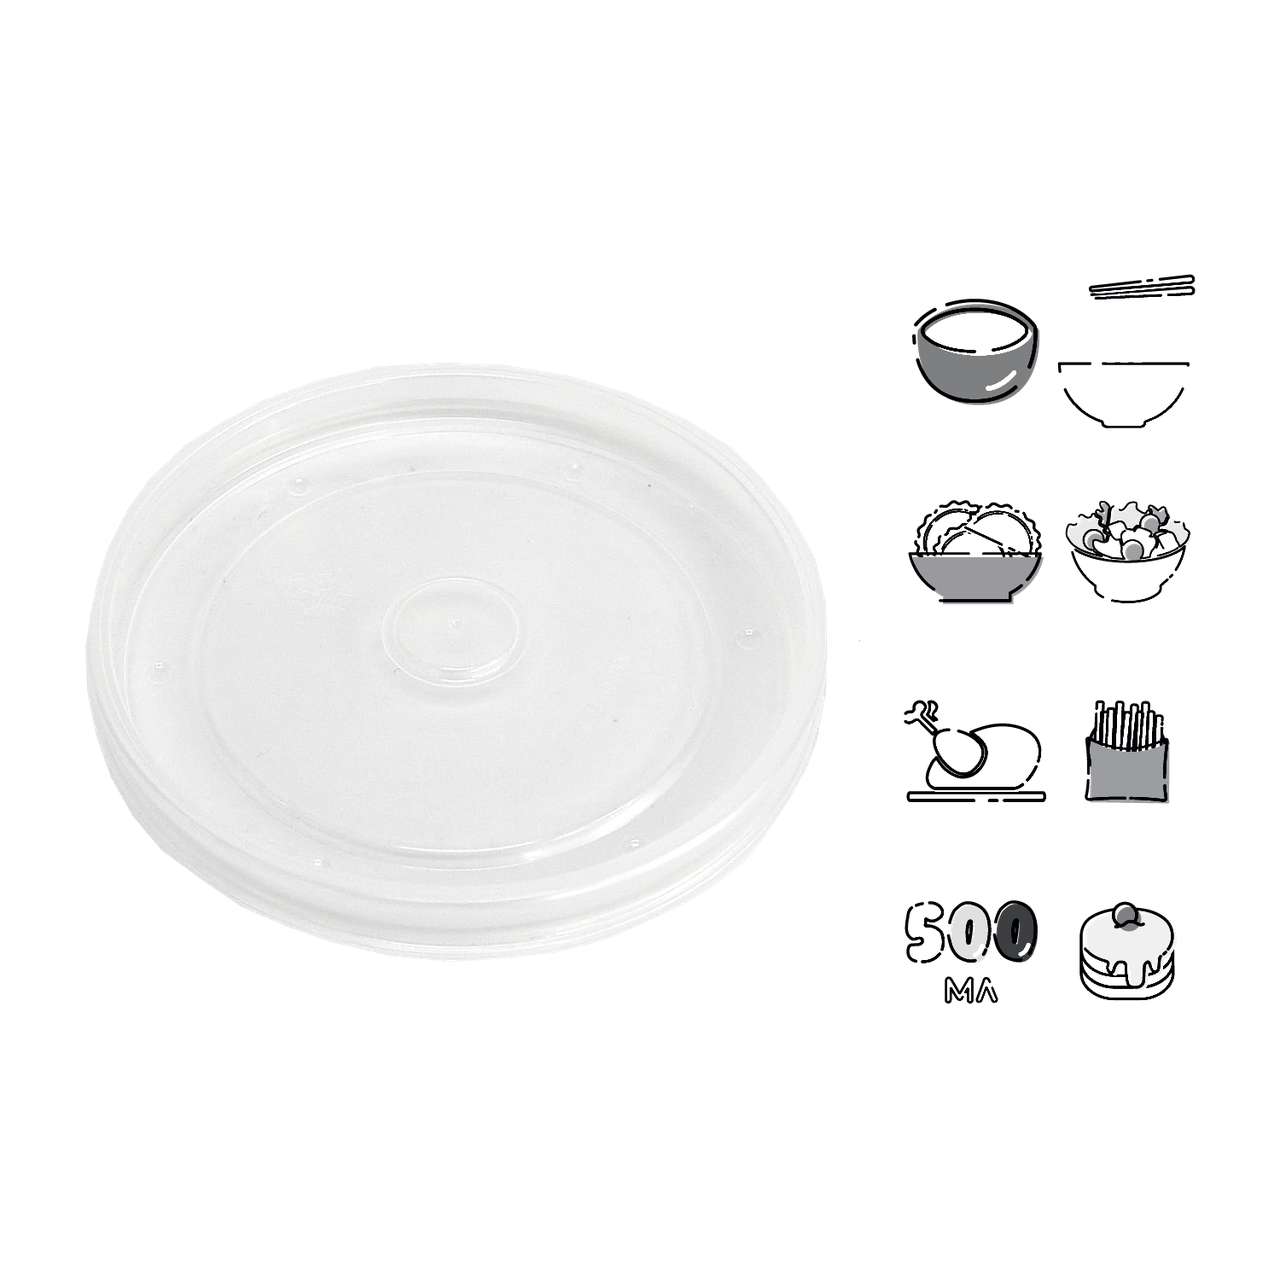 Крышка пластик КР9.7 (1уп/50шт)/(1ящ/10уп/500шт)